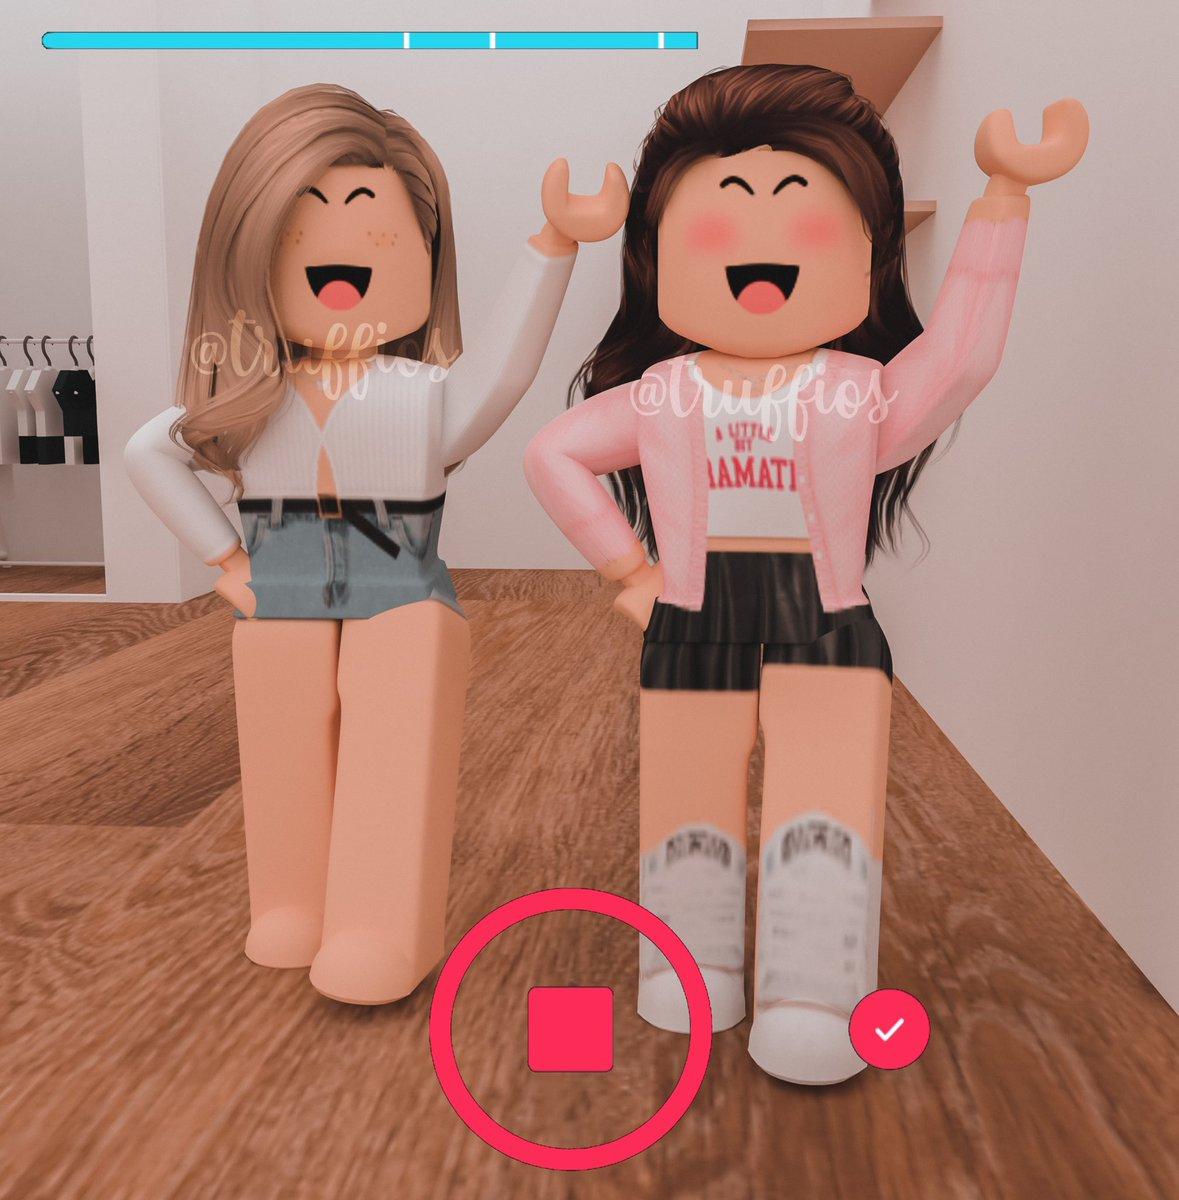 2 Gfx Roblox Girls Truffles Truffios Twitter